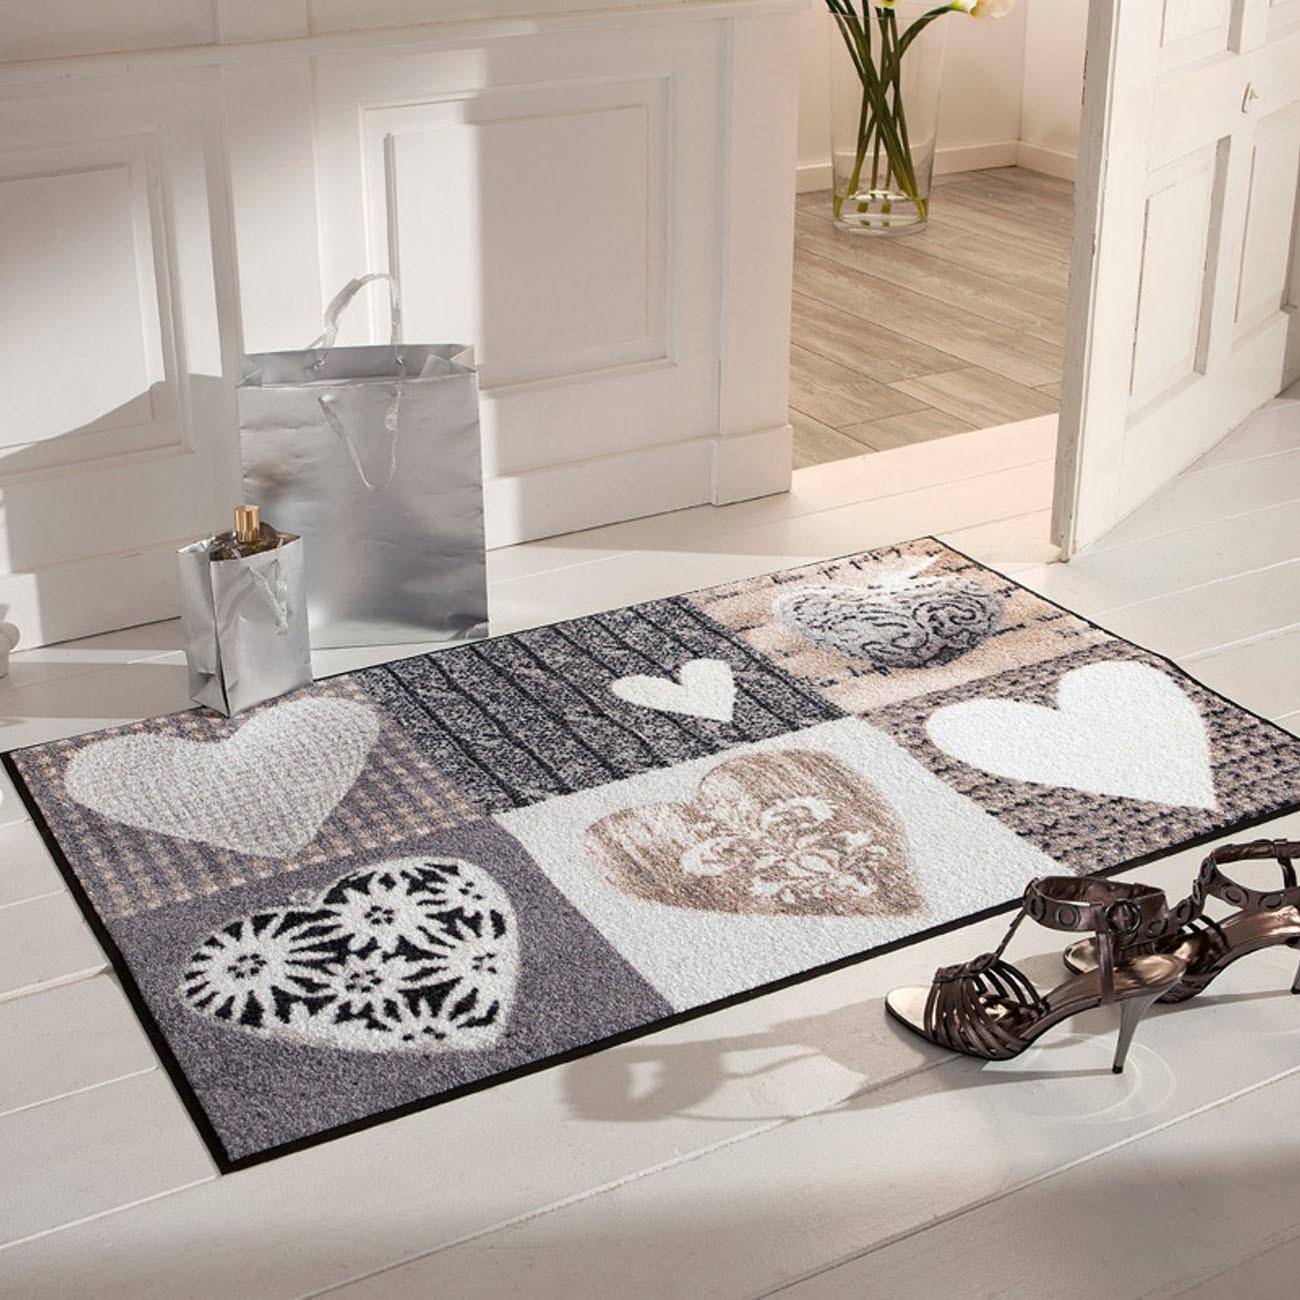 salonloewe fu matte waschbar alpengl ck herzen 75x120 cm sld0122 075x120. Black Bedroom Furniture Sets. Home Design Ideas